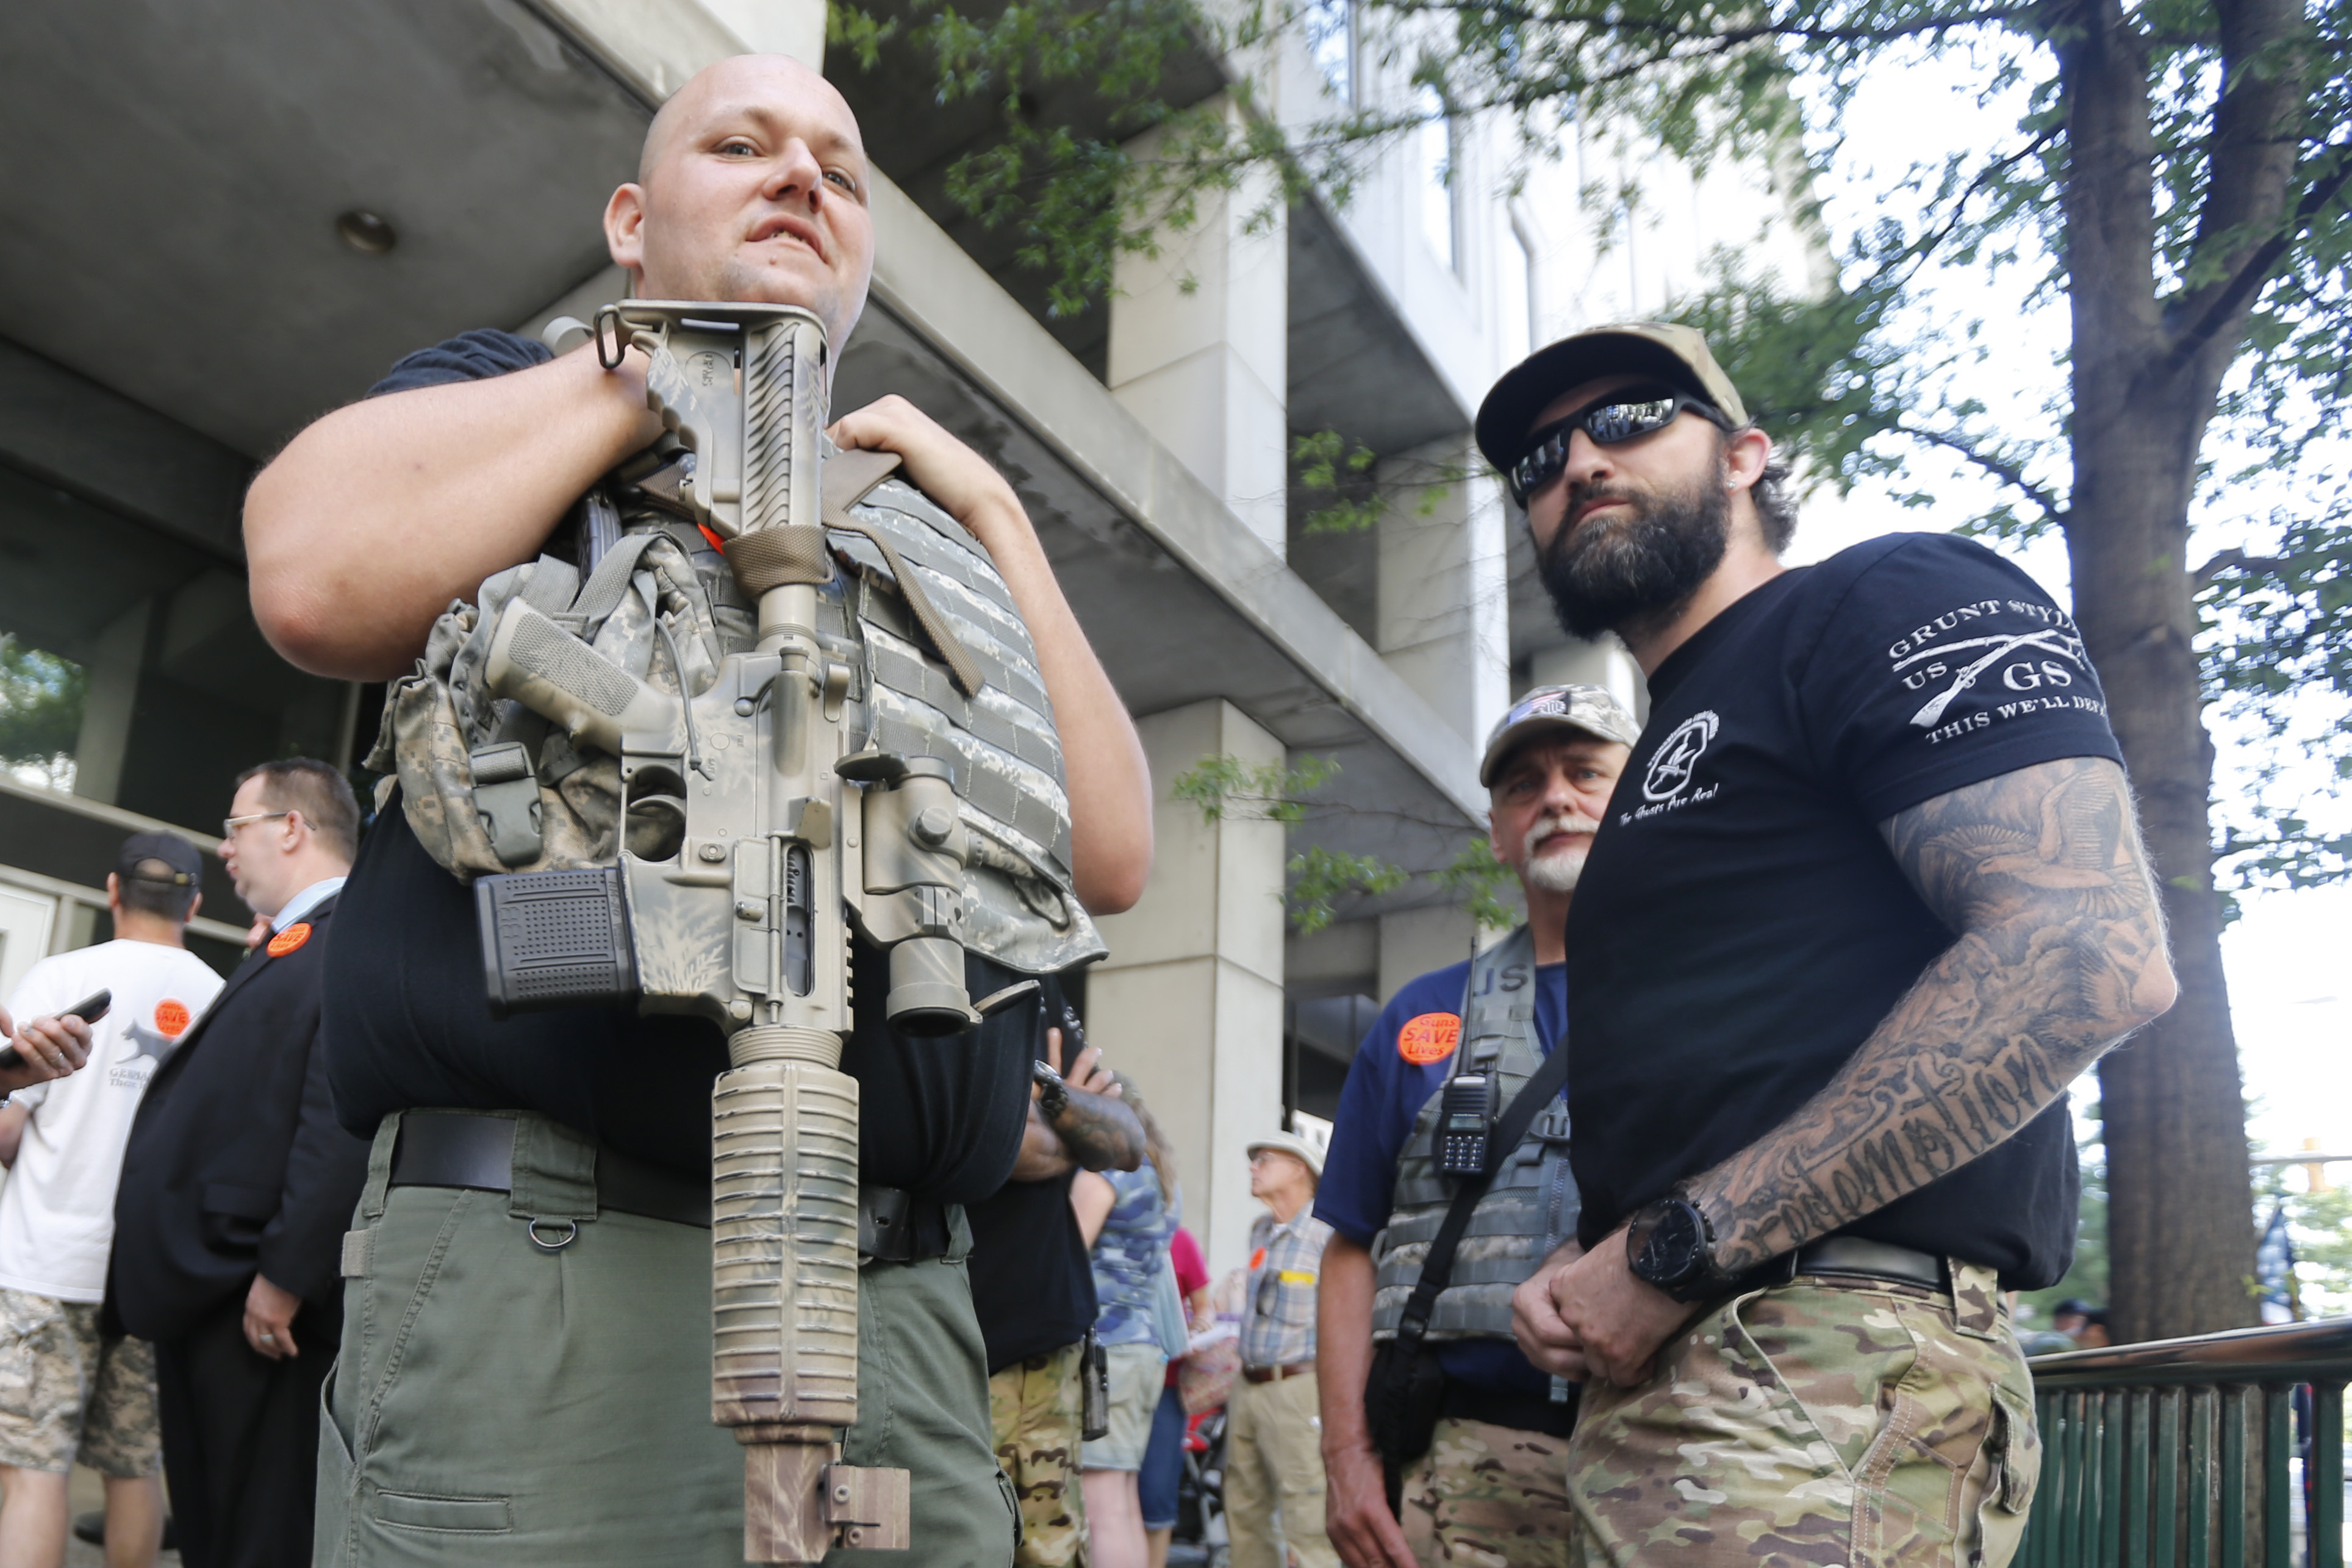 The NRA is in turmoil. But in Virginia gun debate this week, the group flexed muscles - The Washington Post